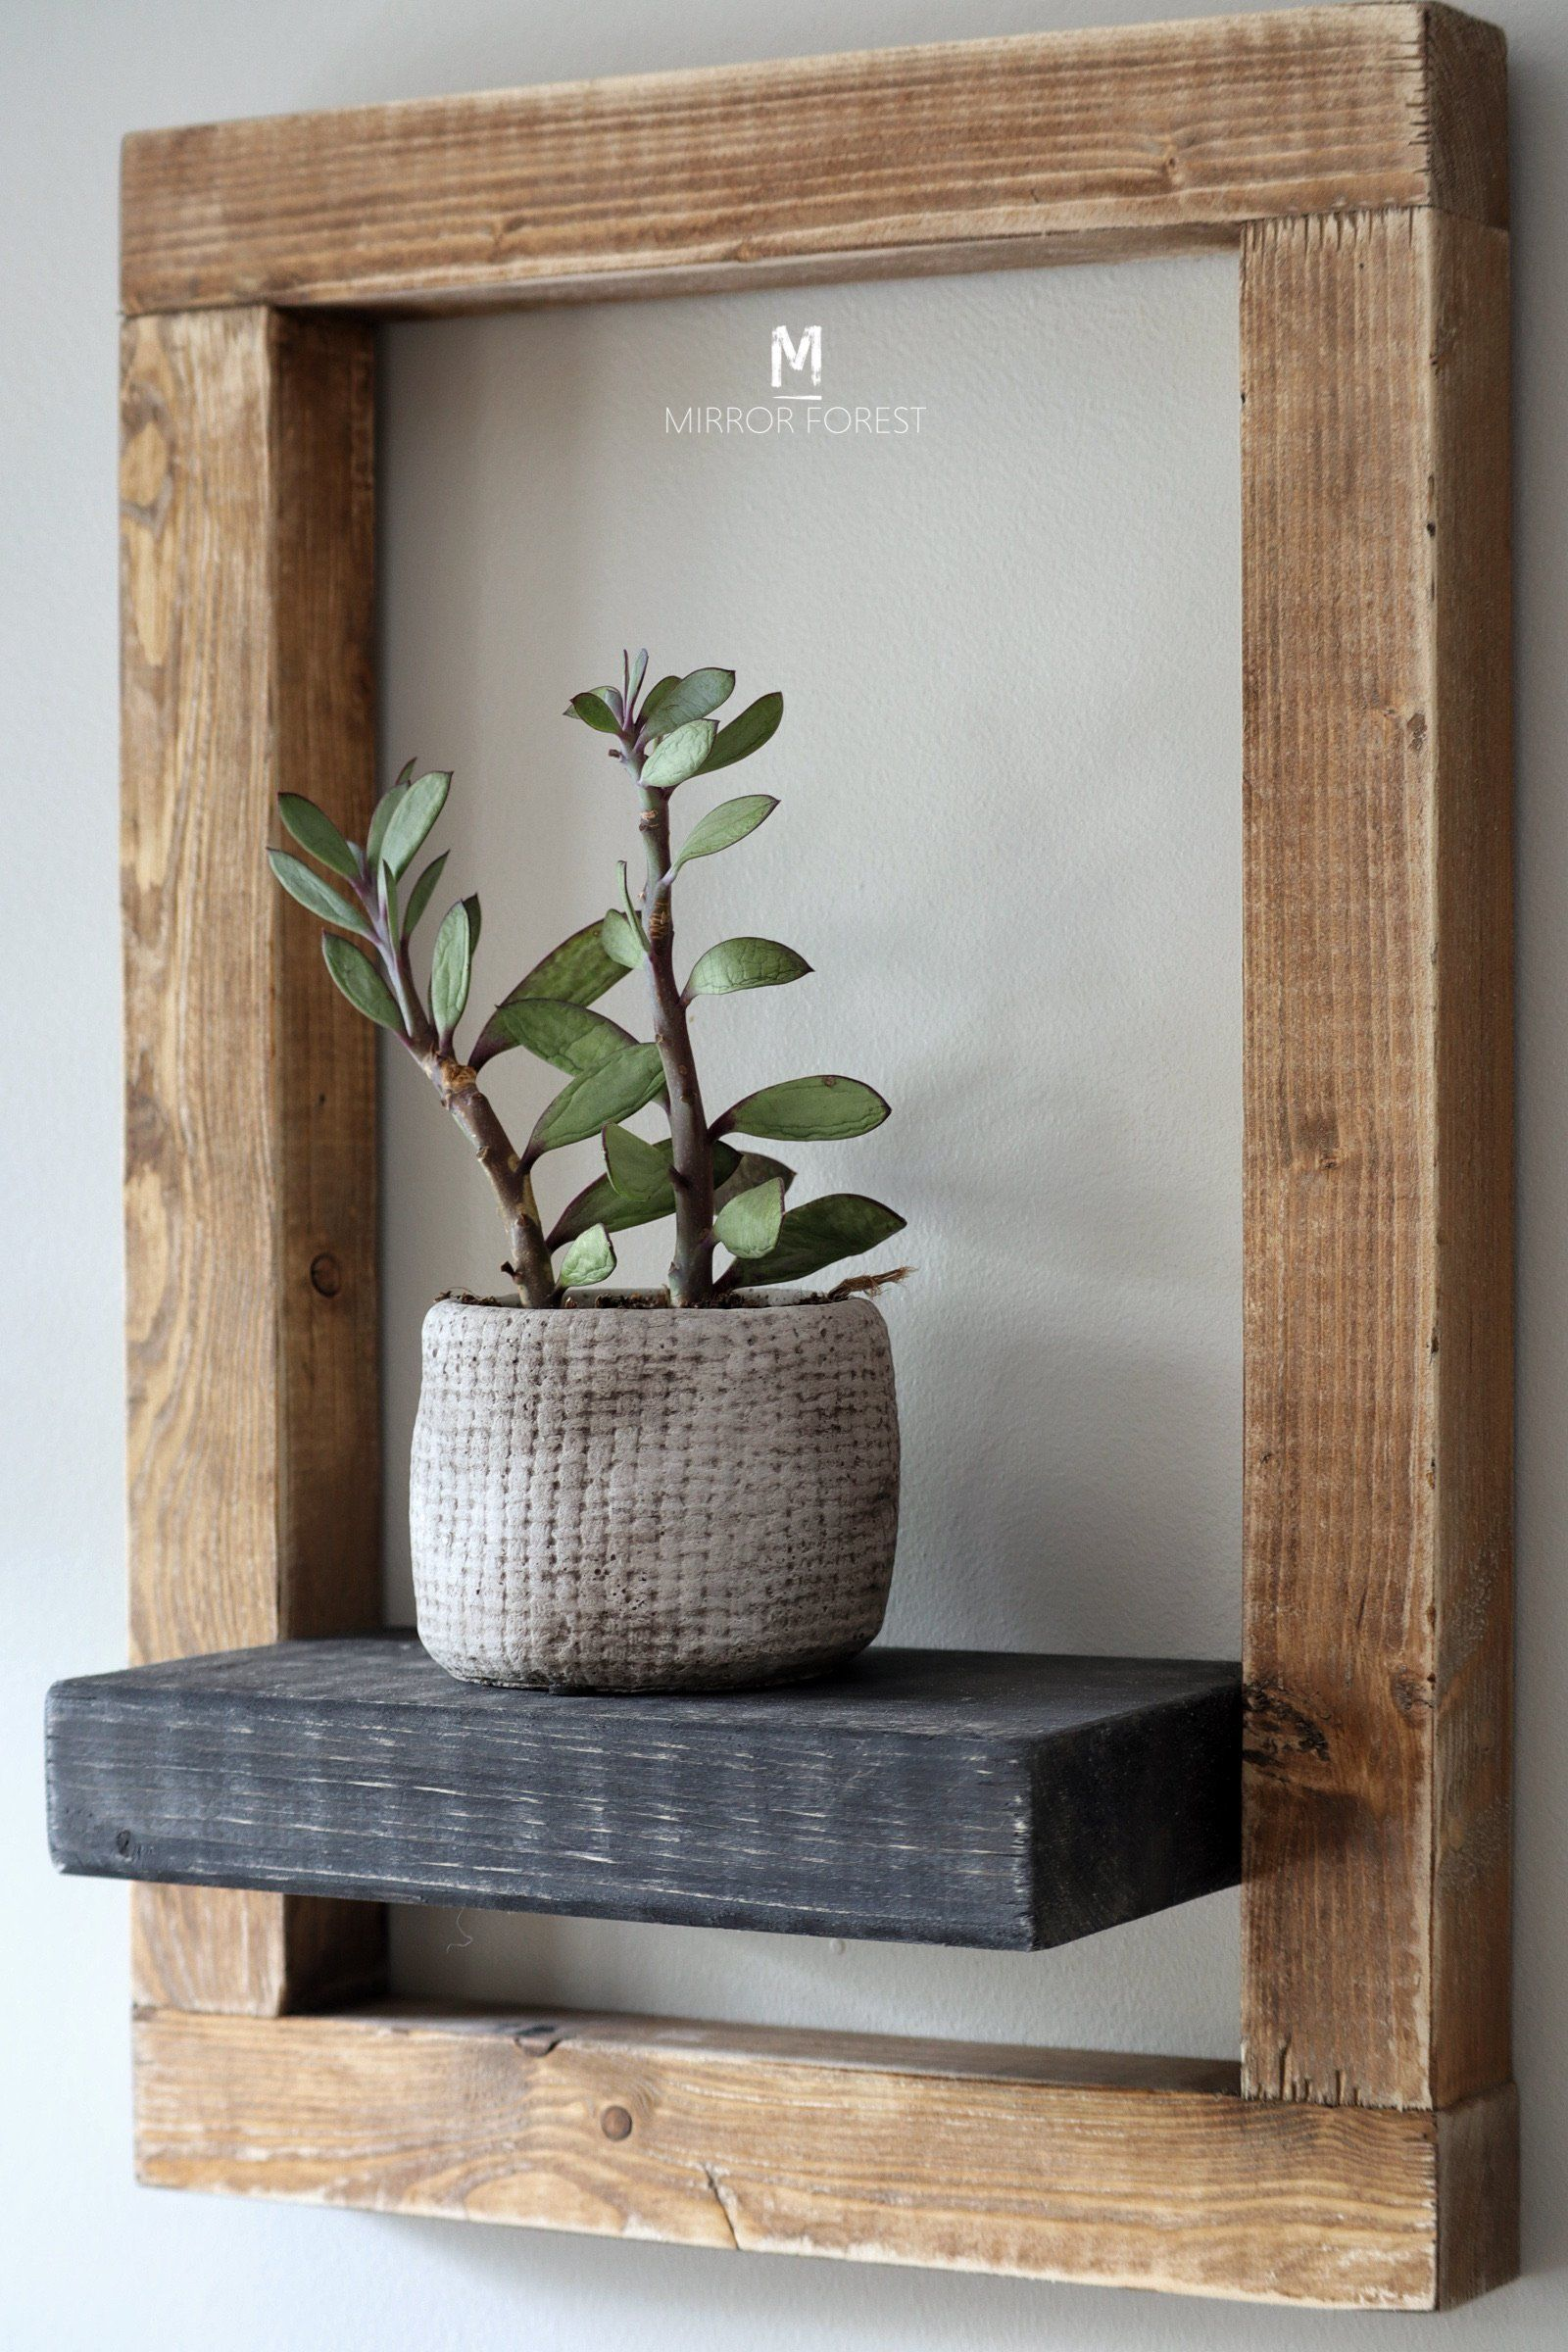 Framed Country House Rustic Shelf / Planter - Light Oak Rustic Finish - Light Oak - Black Shelf